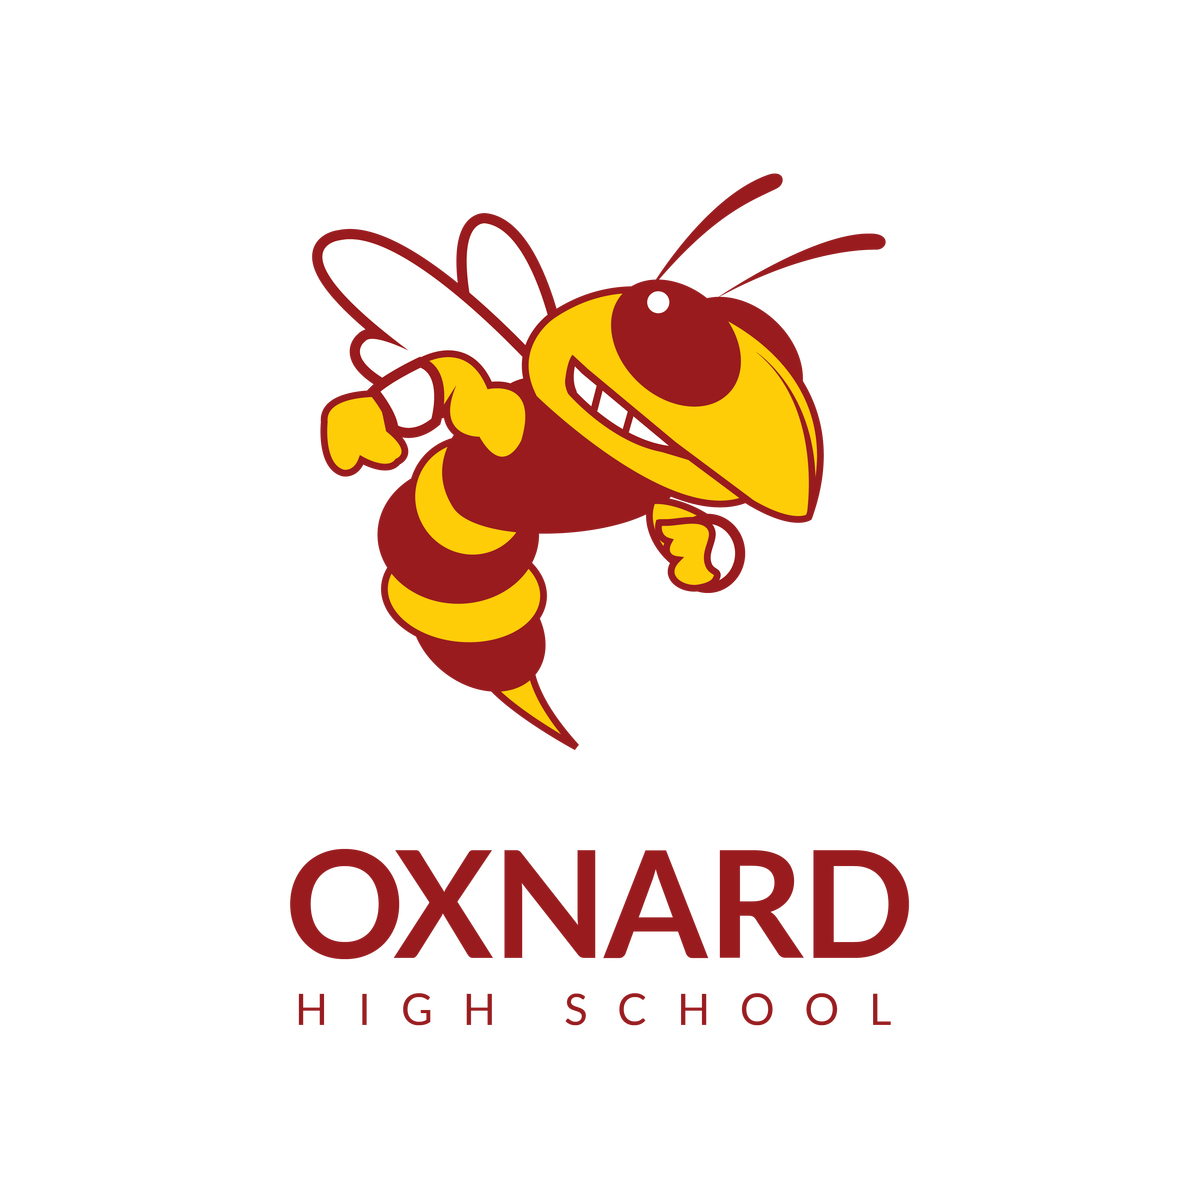 oxnard-high-school